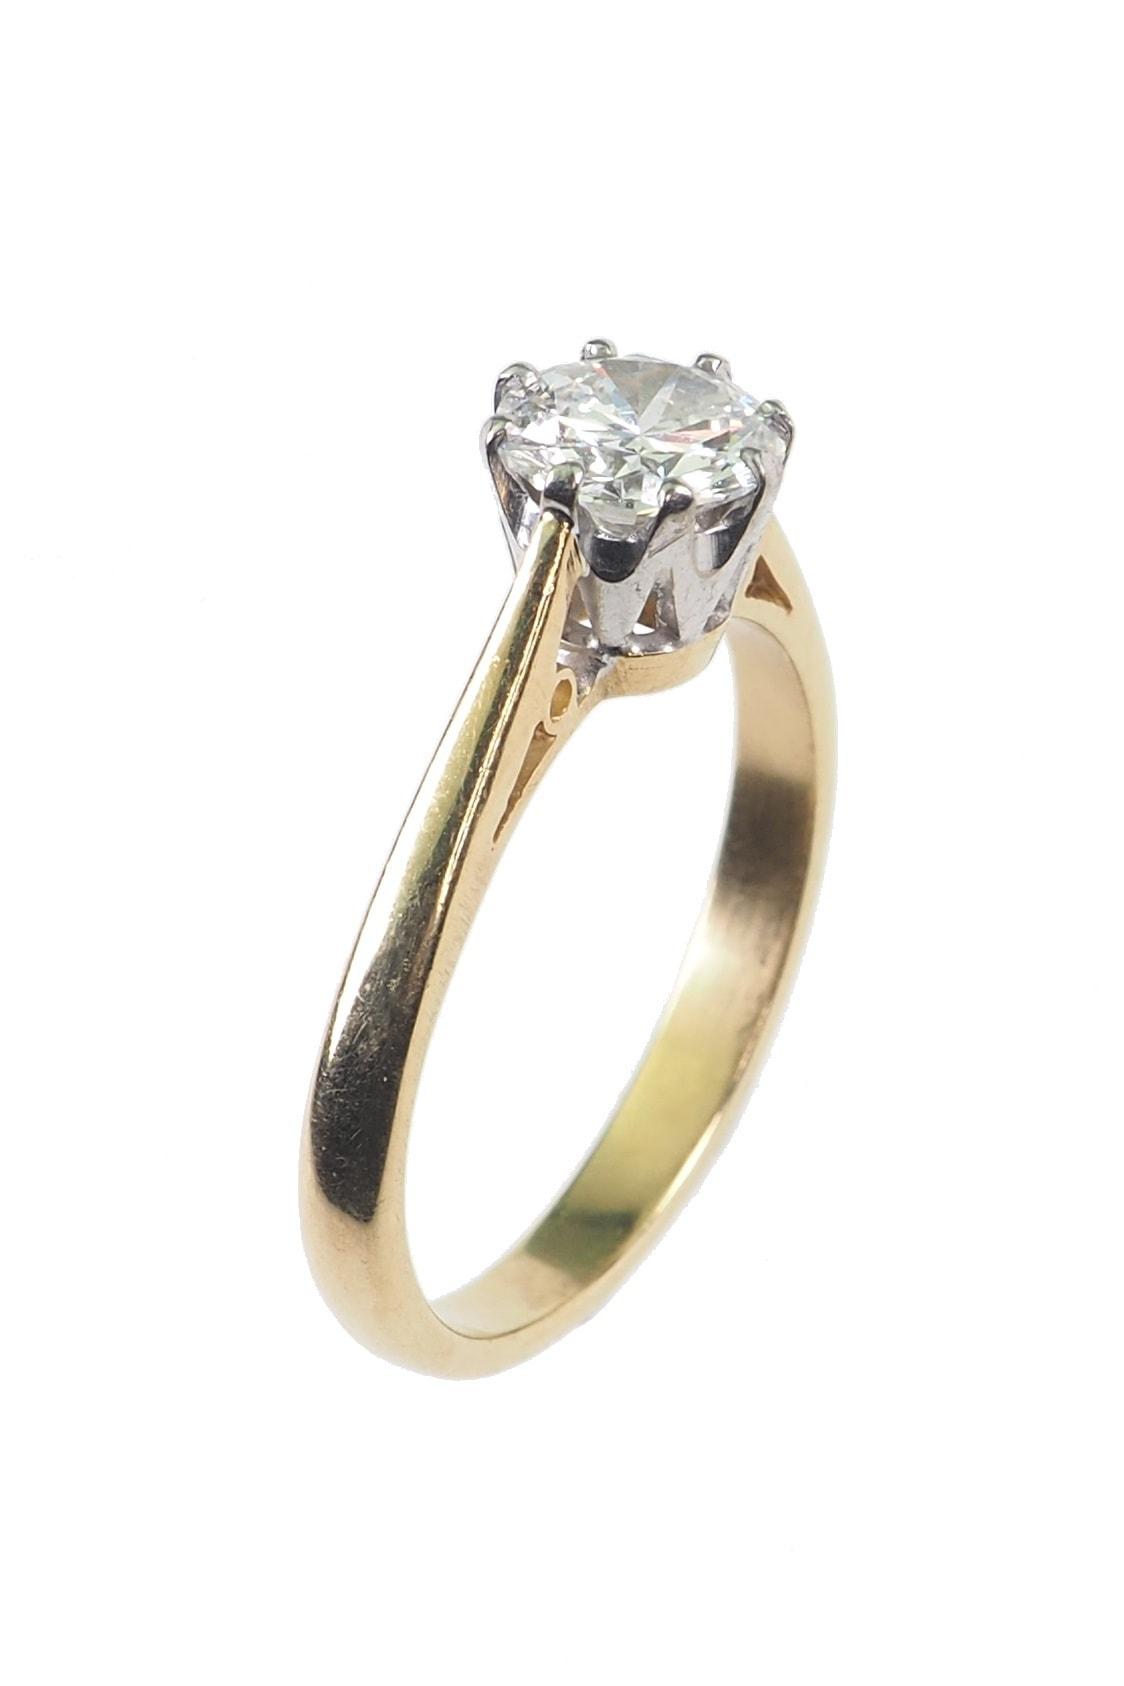 zertifizierten-Diamantschmuck-kaufen-0226b